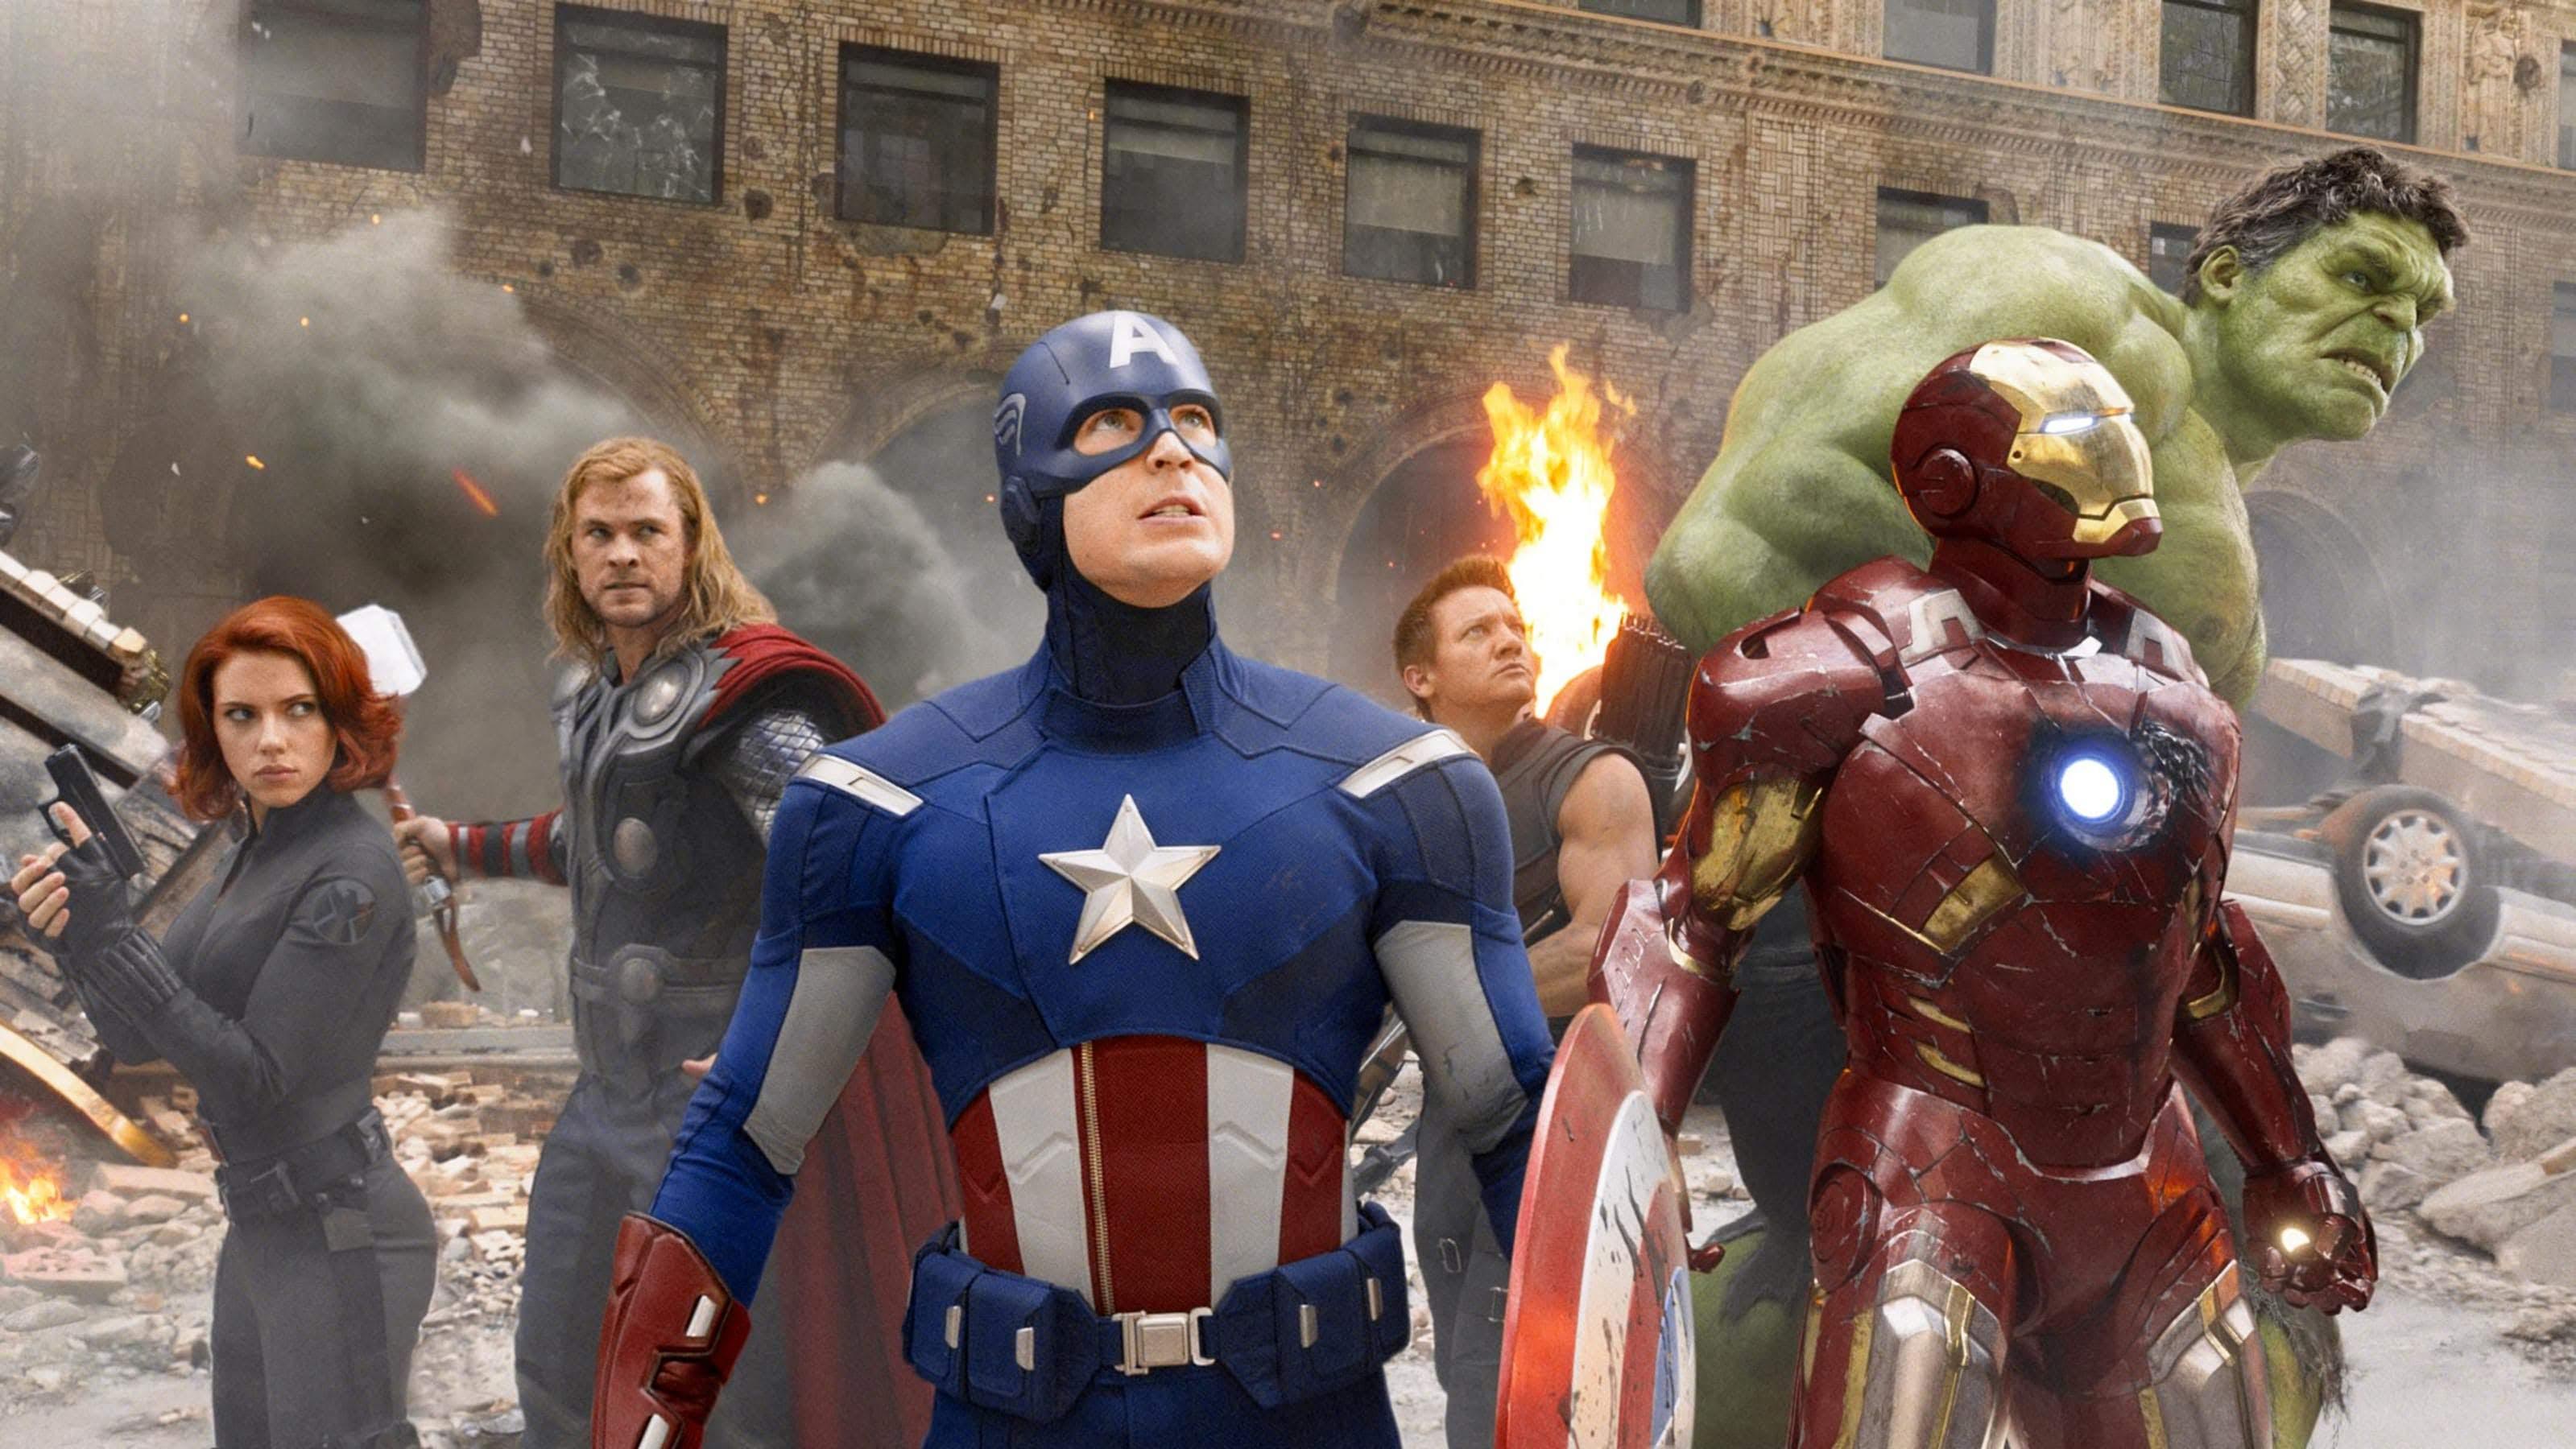 Evolution of Marvel Cinematic Universe : いよいよ明日公開の「アベンジャーズ : エンドゲーム」に備えて、マーベルのコミックヒーロー映画の流れを振り返って、約16分間にまとめた永久保存版のシネマティック・ユニバース丸ごとダイジェスト・ビデオ ! !